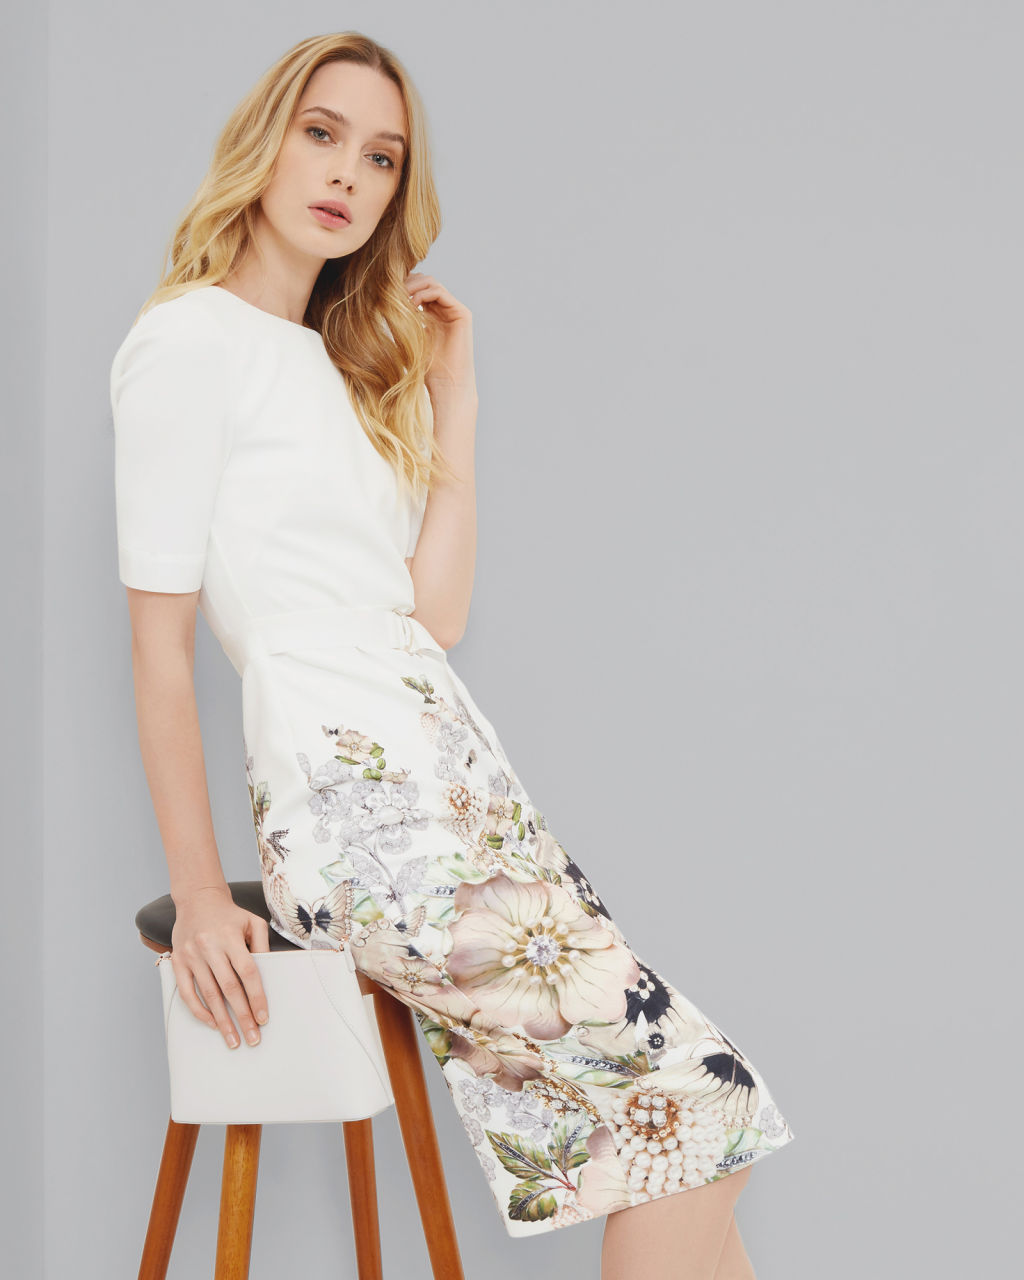 Ted Baker // LAYLI Gem Gardens Bodycon Dress // $315